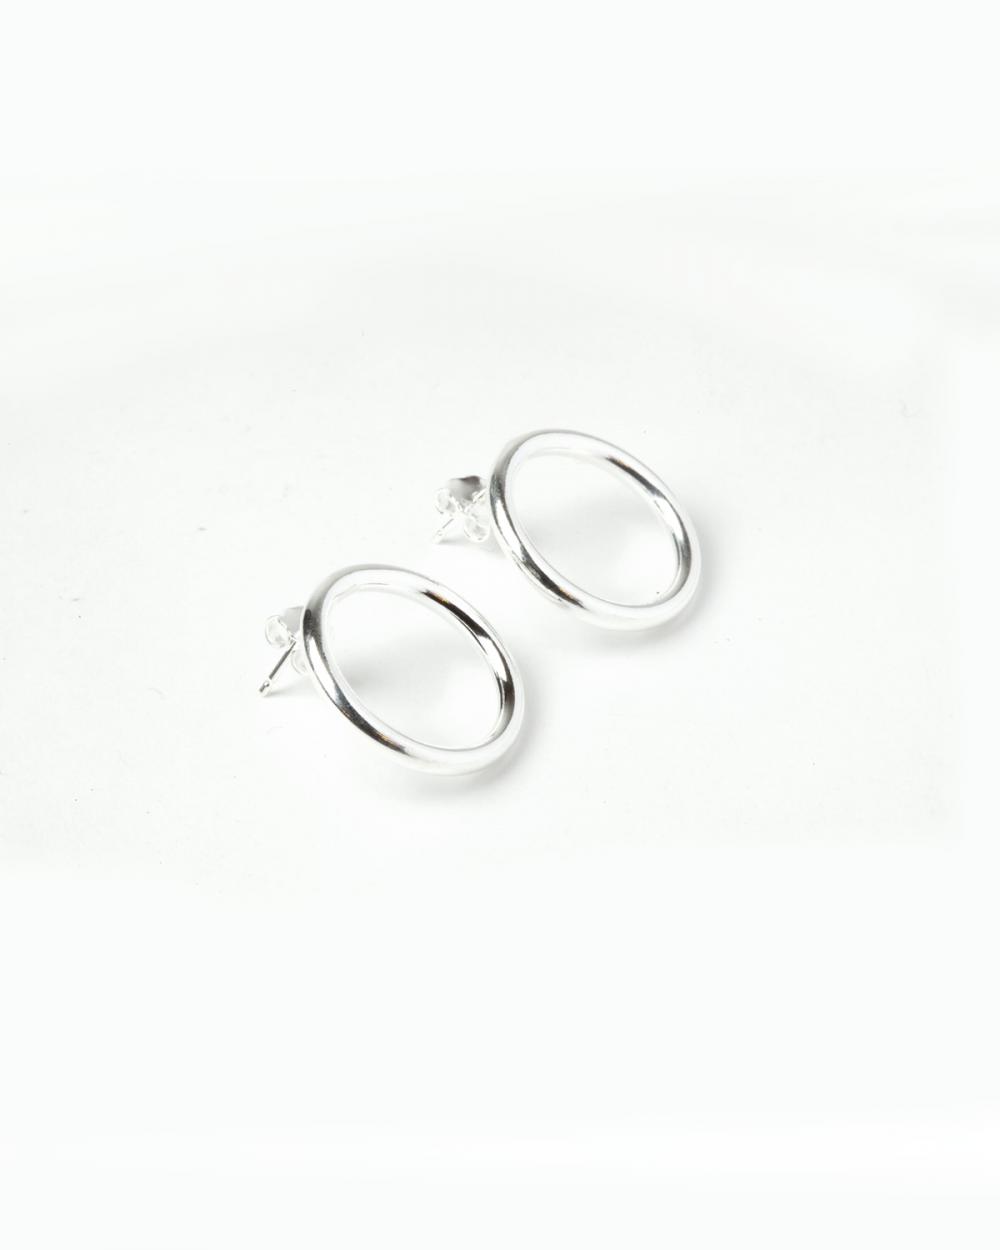 Earrings ORECCHINI COPPIA LOBO CERCHIO / ARGENTO LUCIDO NOVE25